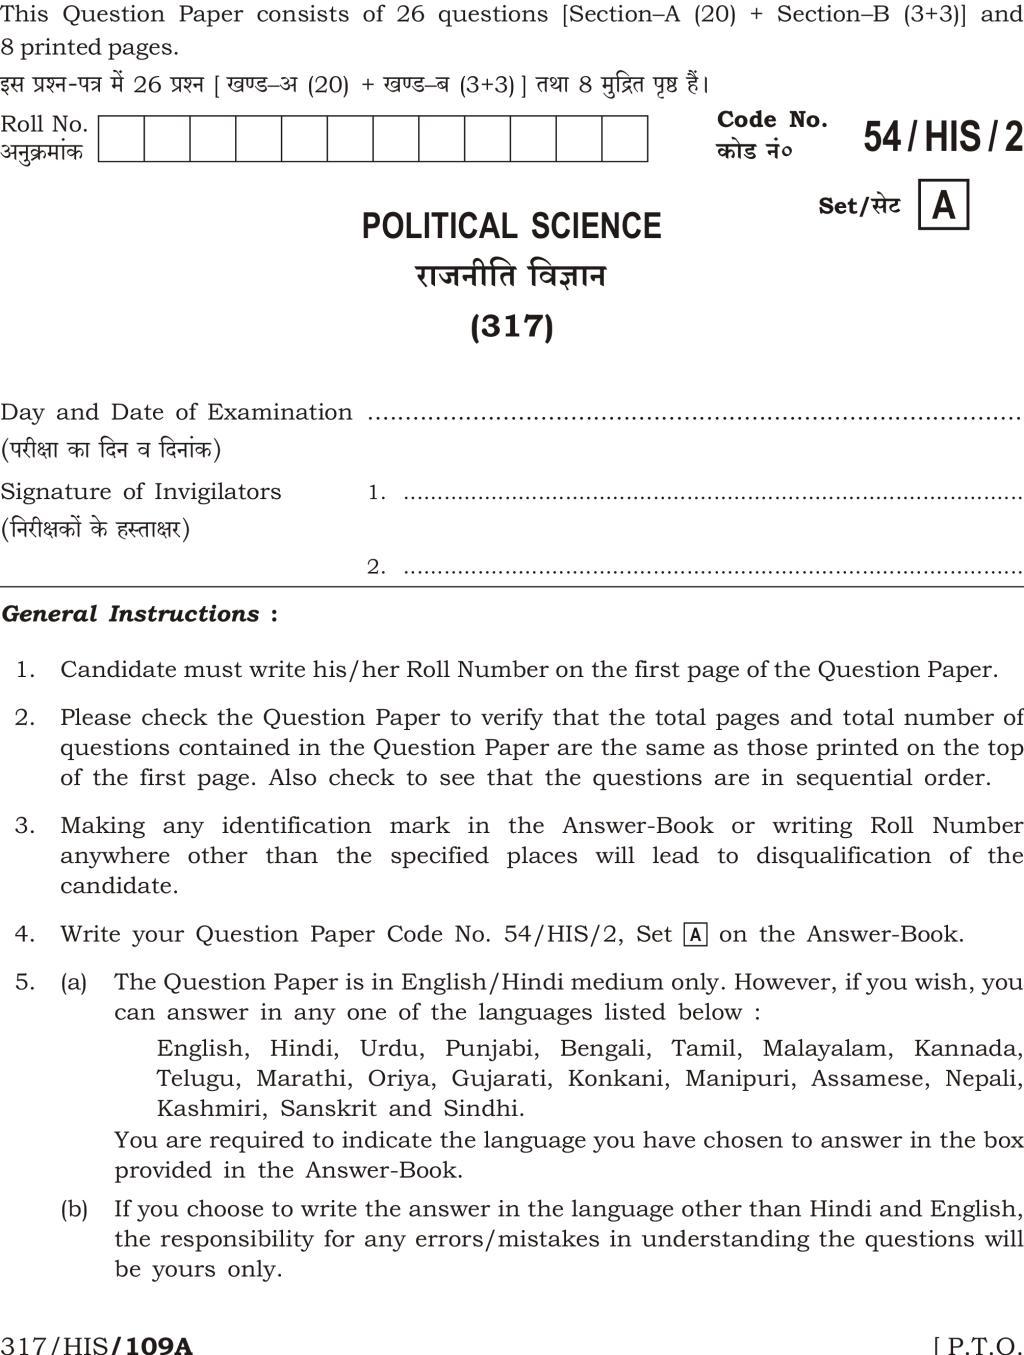 NIOS Class 12 Question Paper Apr 2017 - Political Science - Page 1